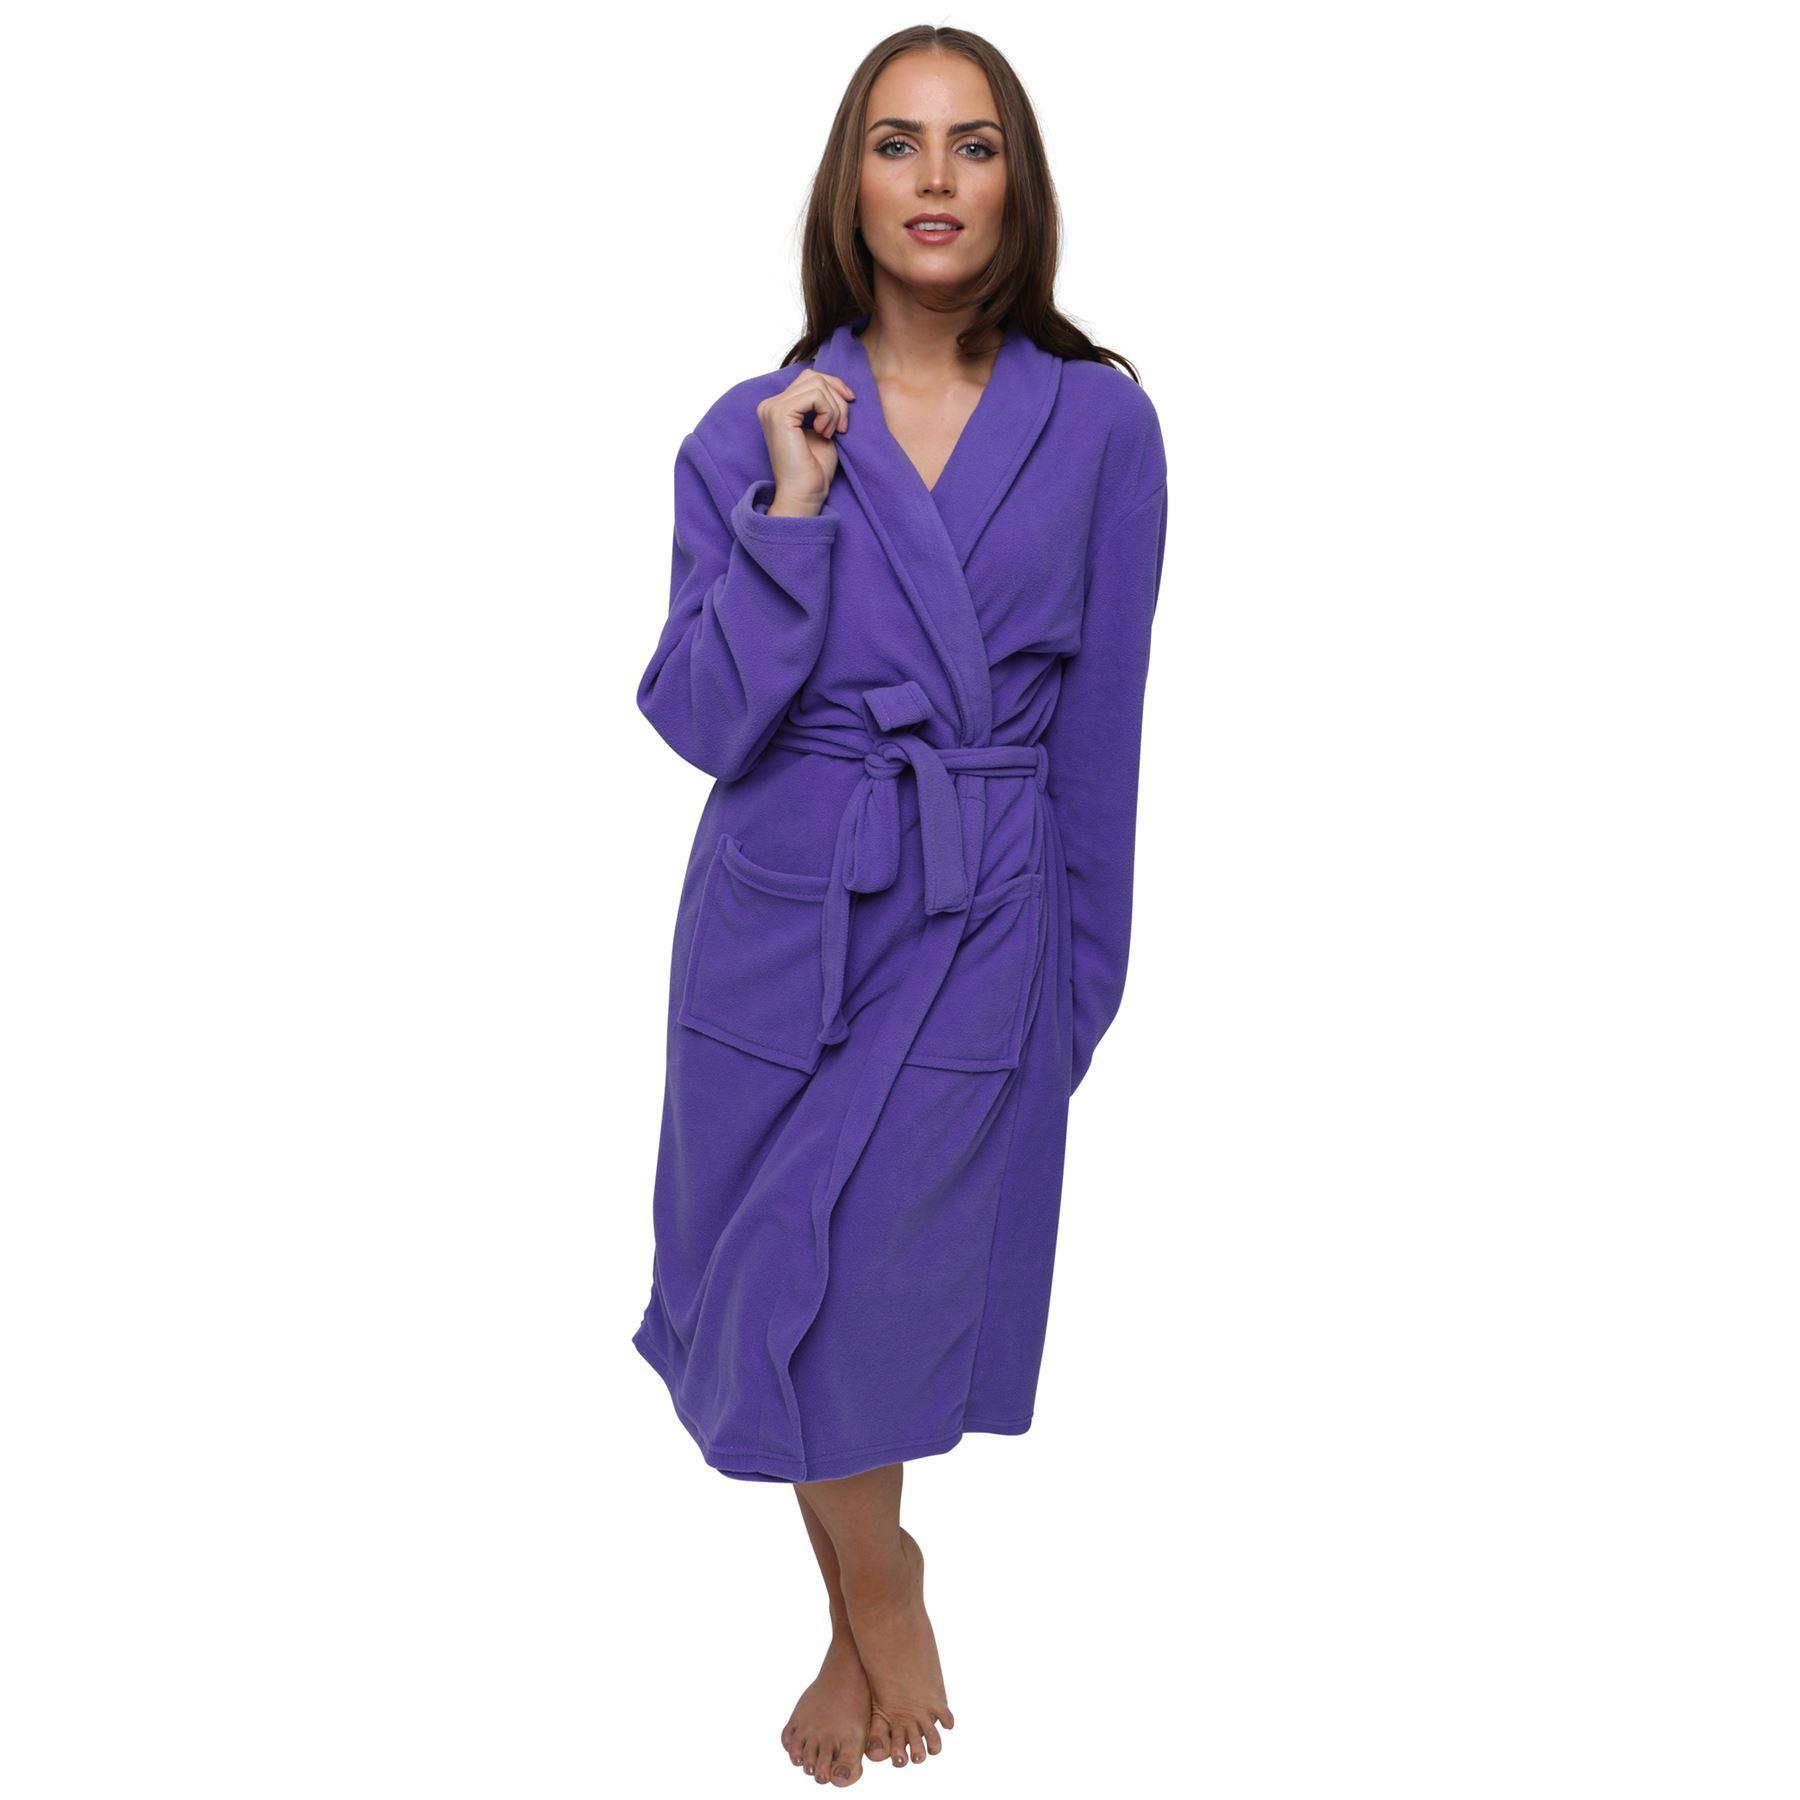 Women's Polar Fleece Robe Dressing Gown, Super Soft, 3 ...